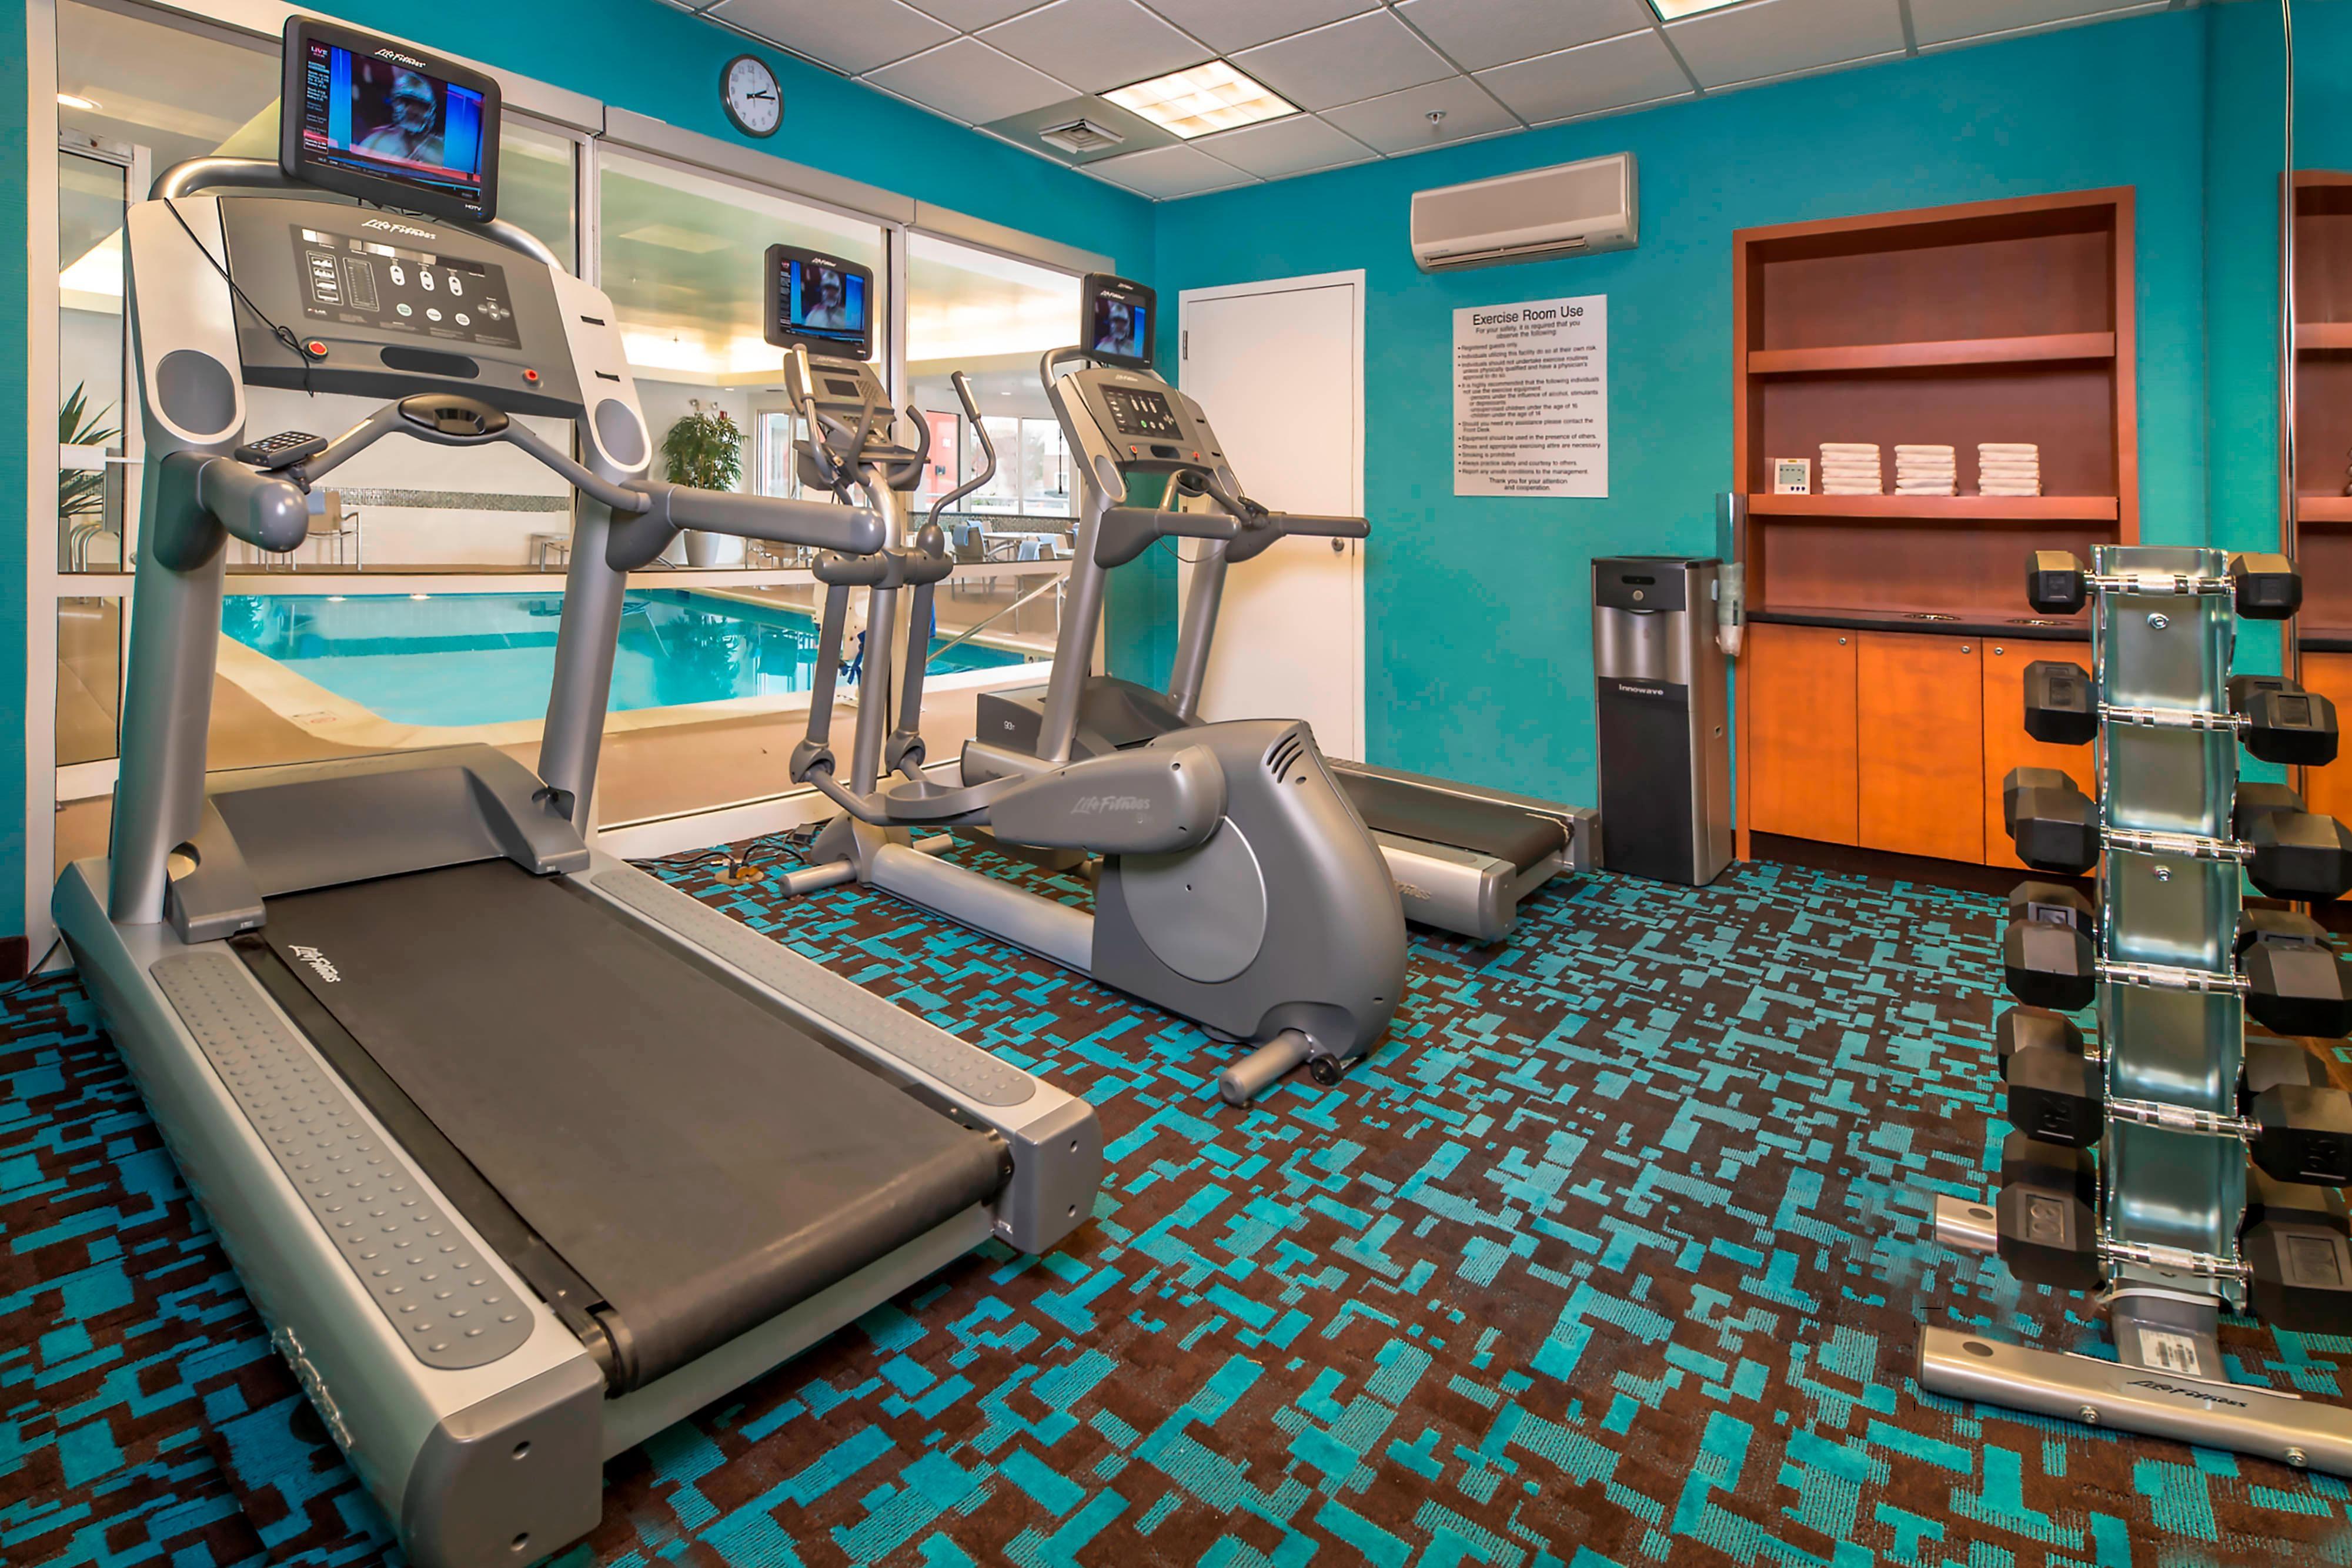 Fairfield Frederick Hotel Fitness Center